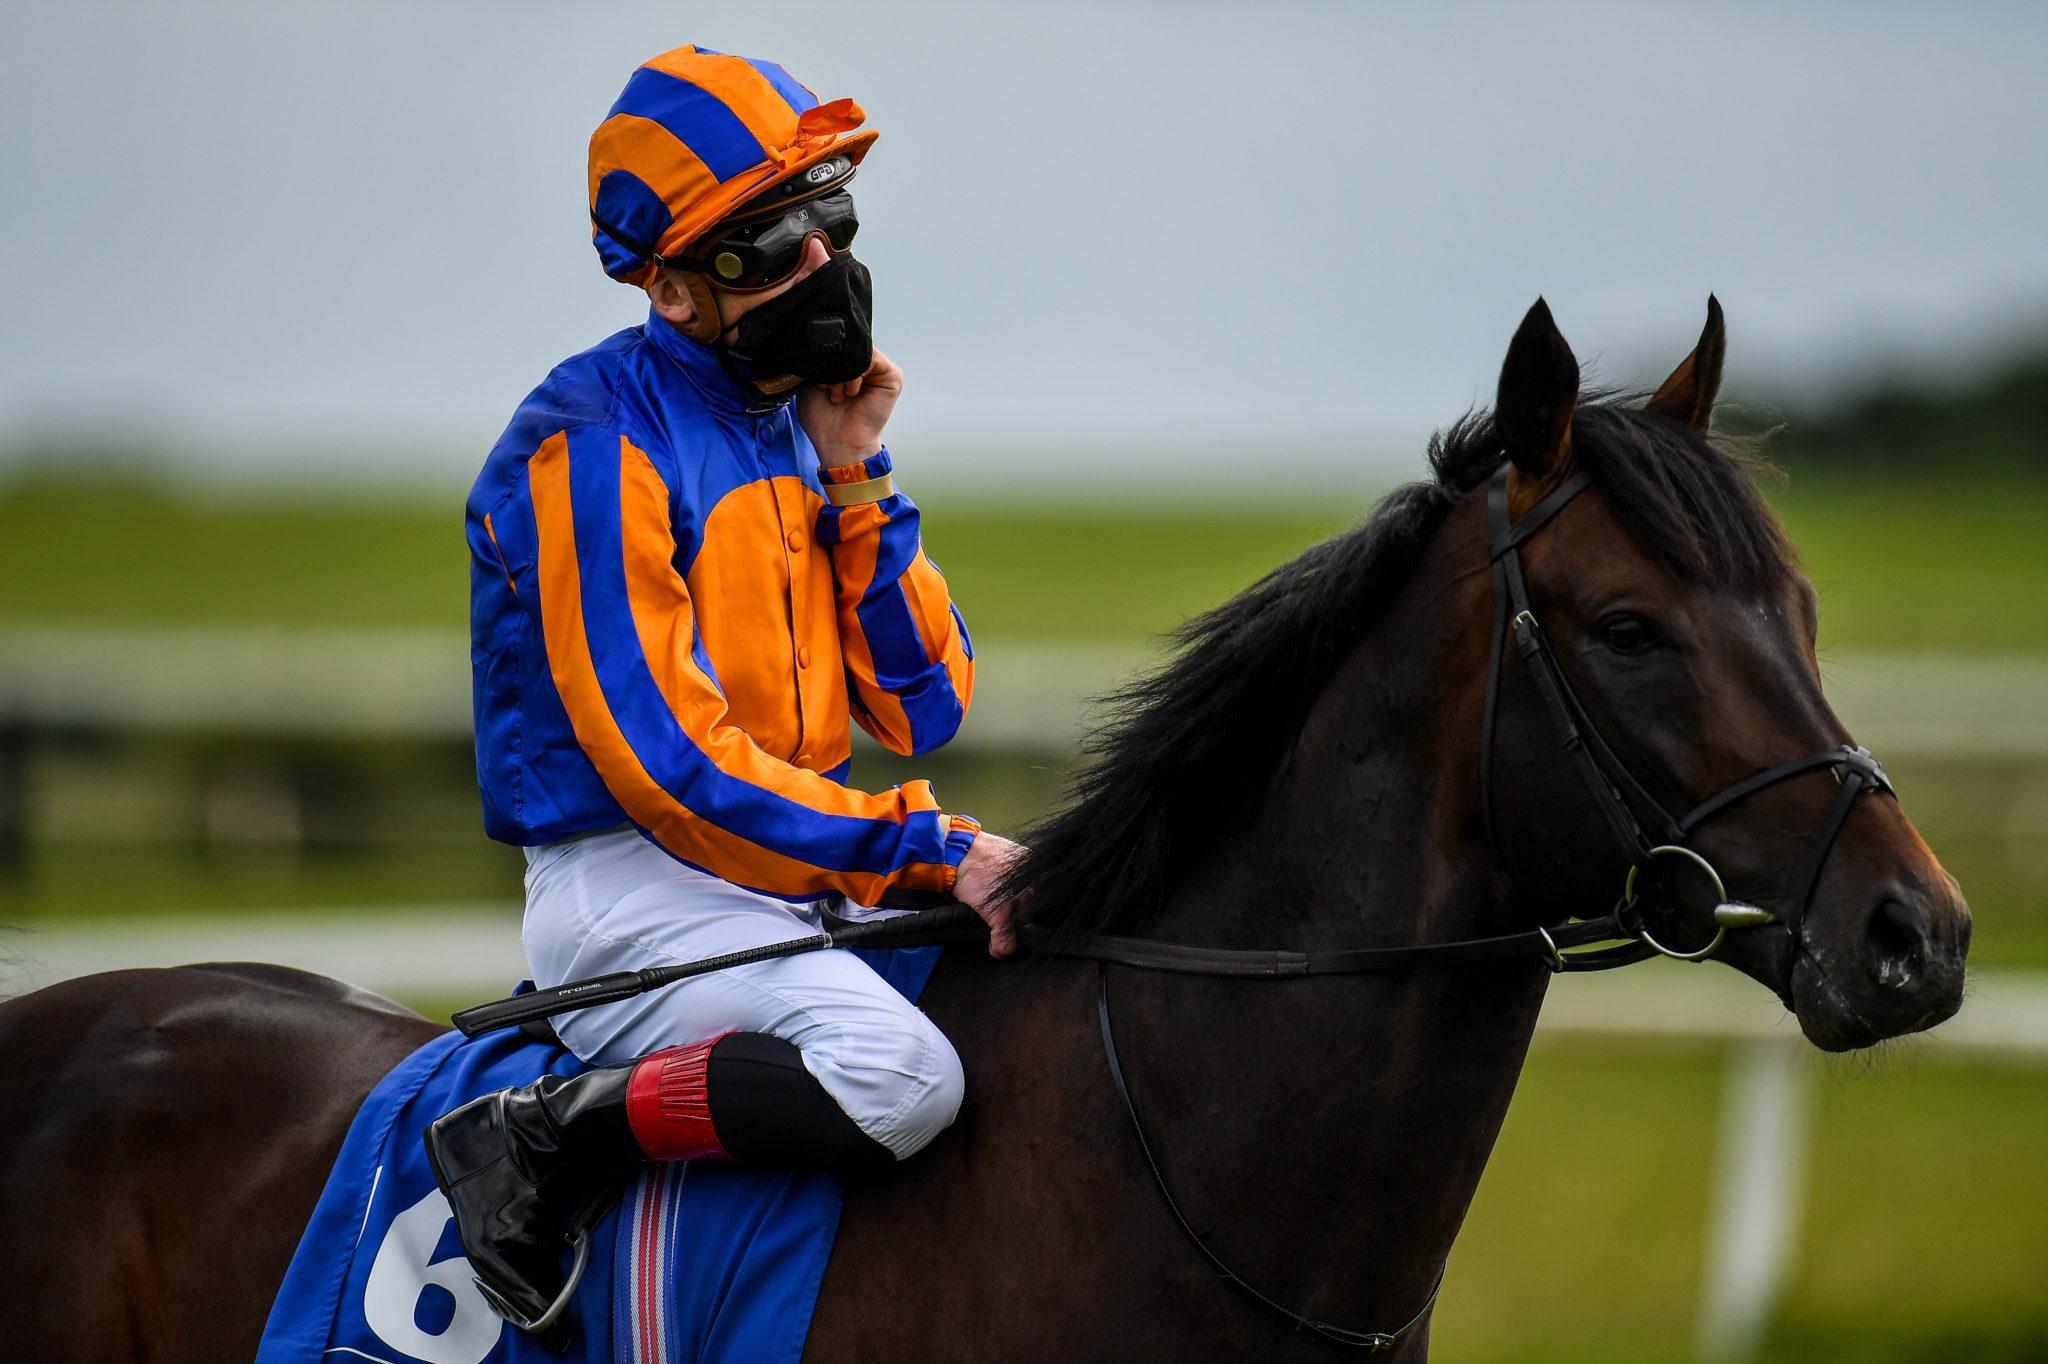 Gavin Ryan winning at the Curragh